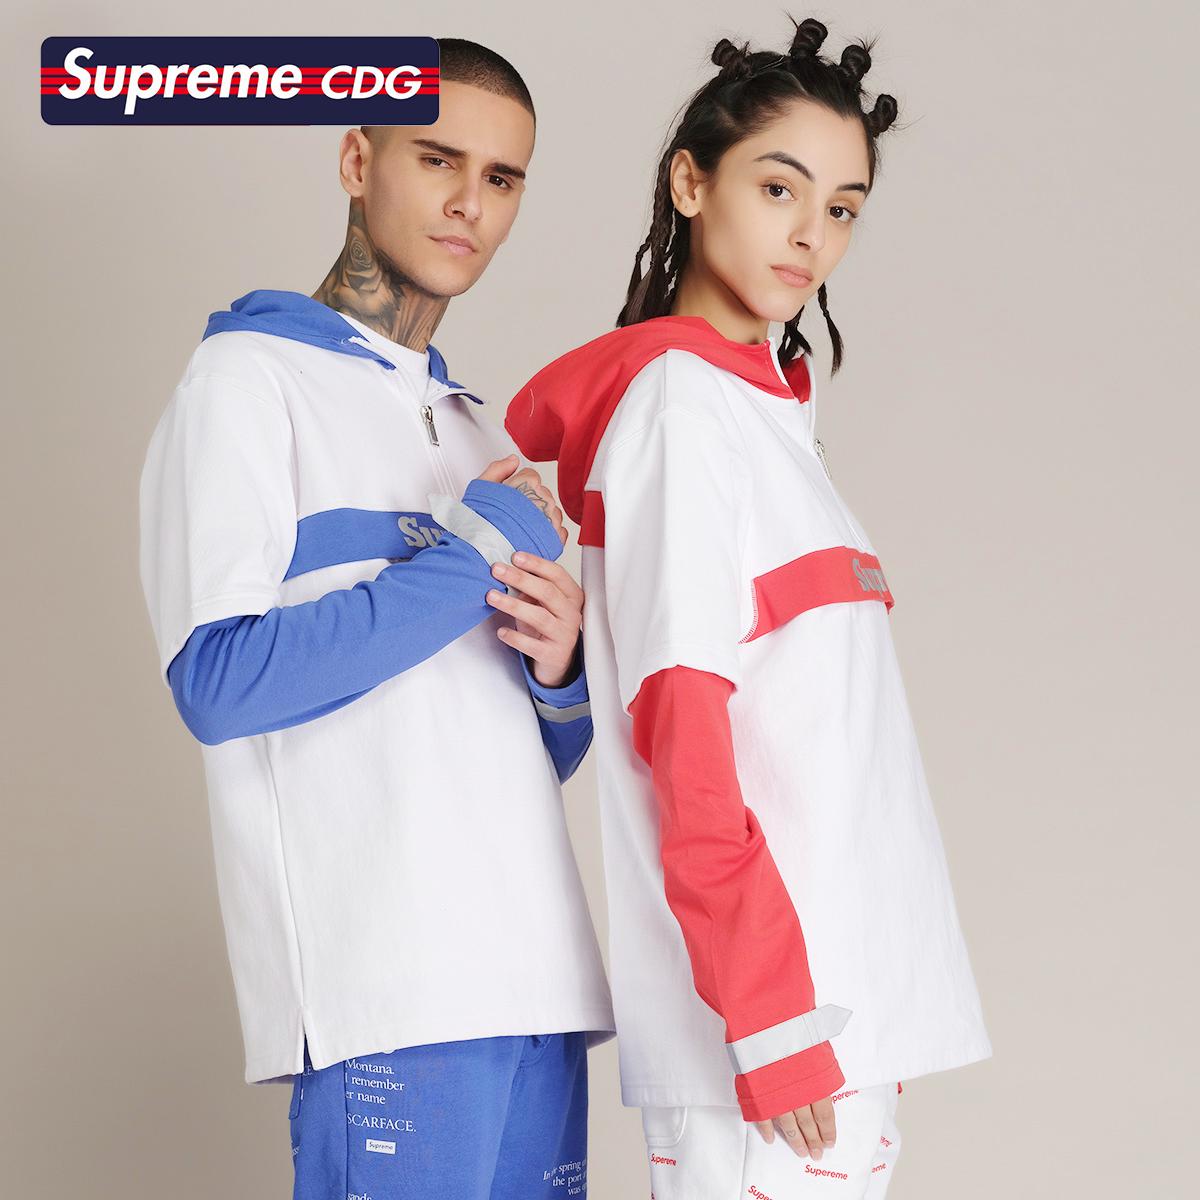 Supreme CDG 2020年春季新款 運動休閑街頭衛衣男女同款套頭衛衣